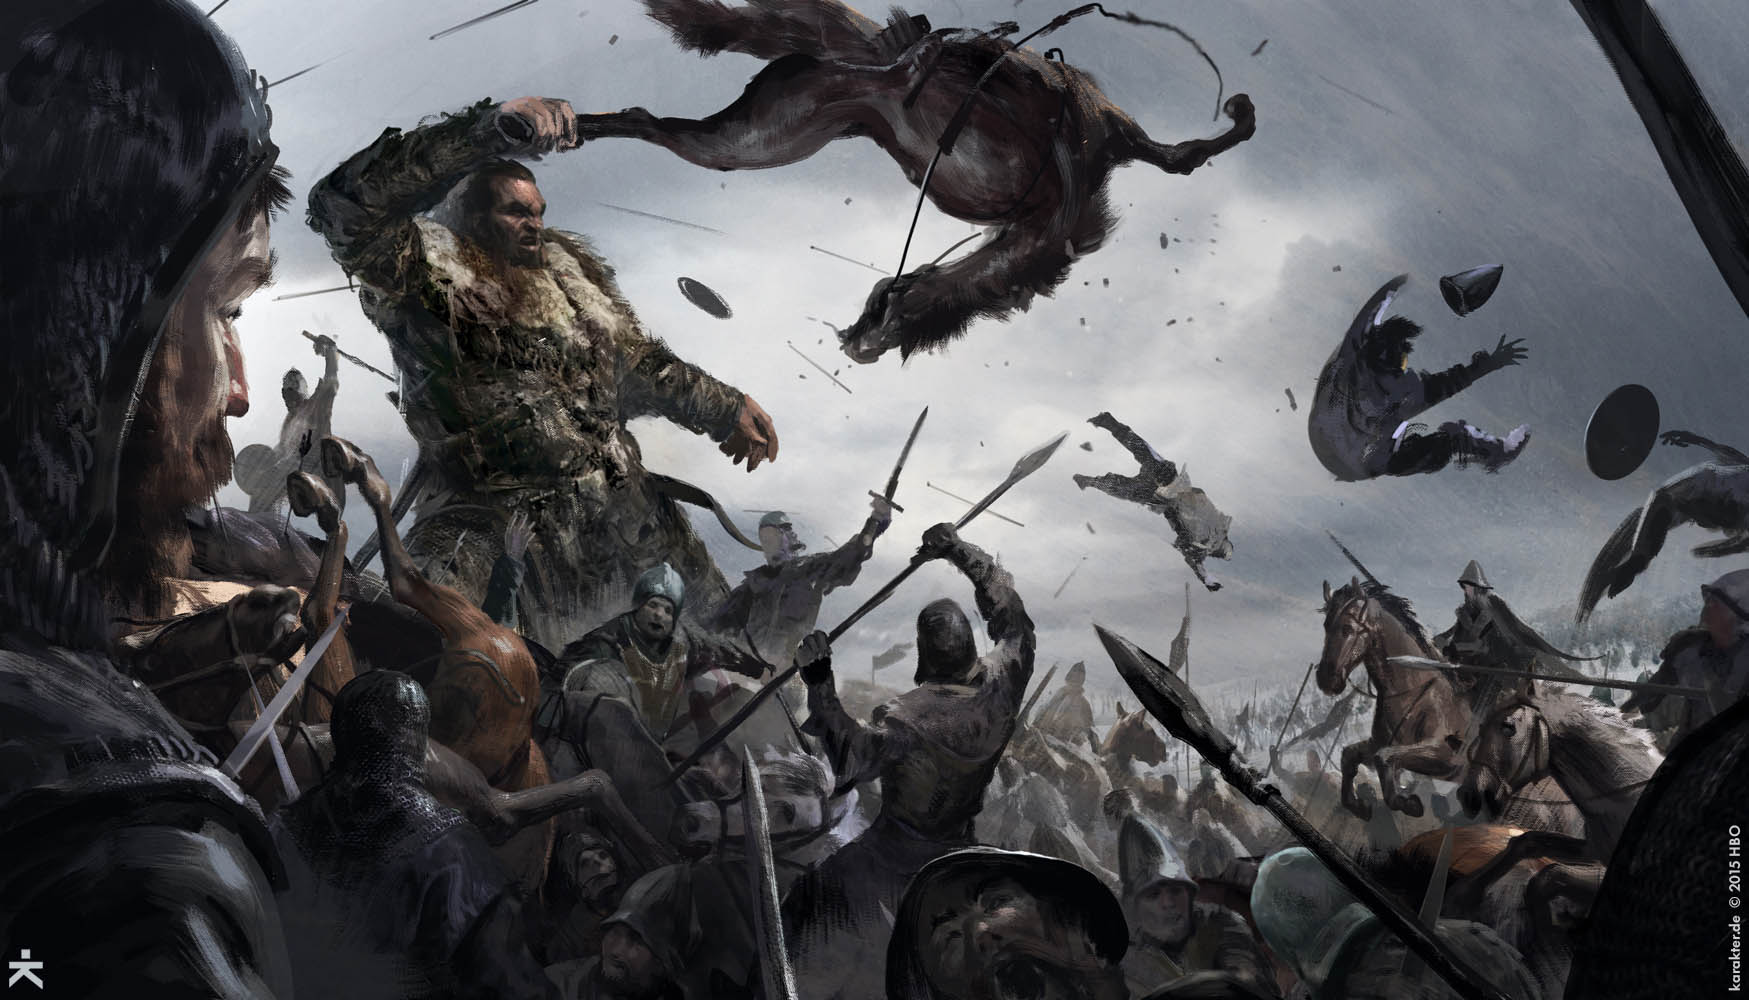 Game Of Thrones Artwork Concept Art From Season 6 Digital ArtLords